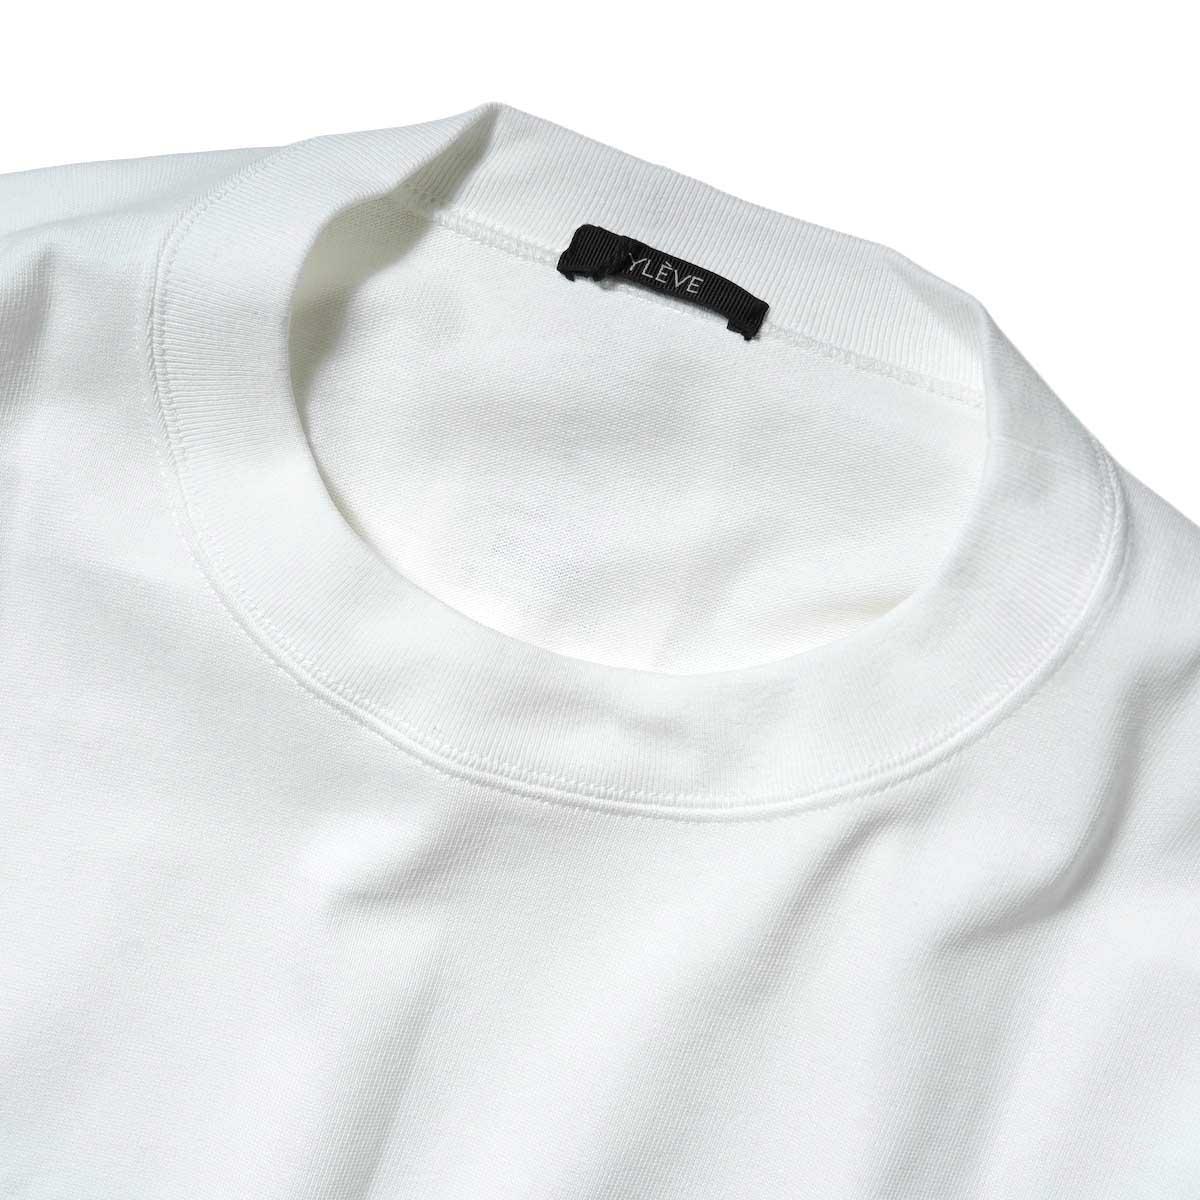 YLEVE / TWIST YARN COTTON BIG P/O (White) ネック